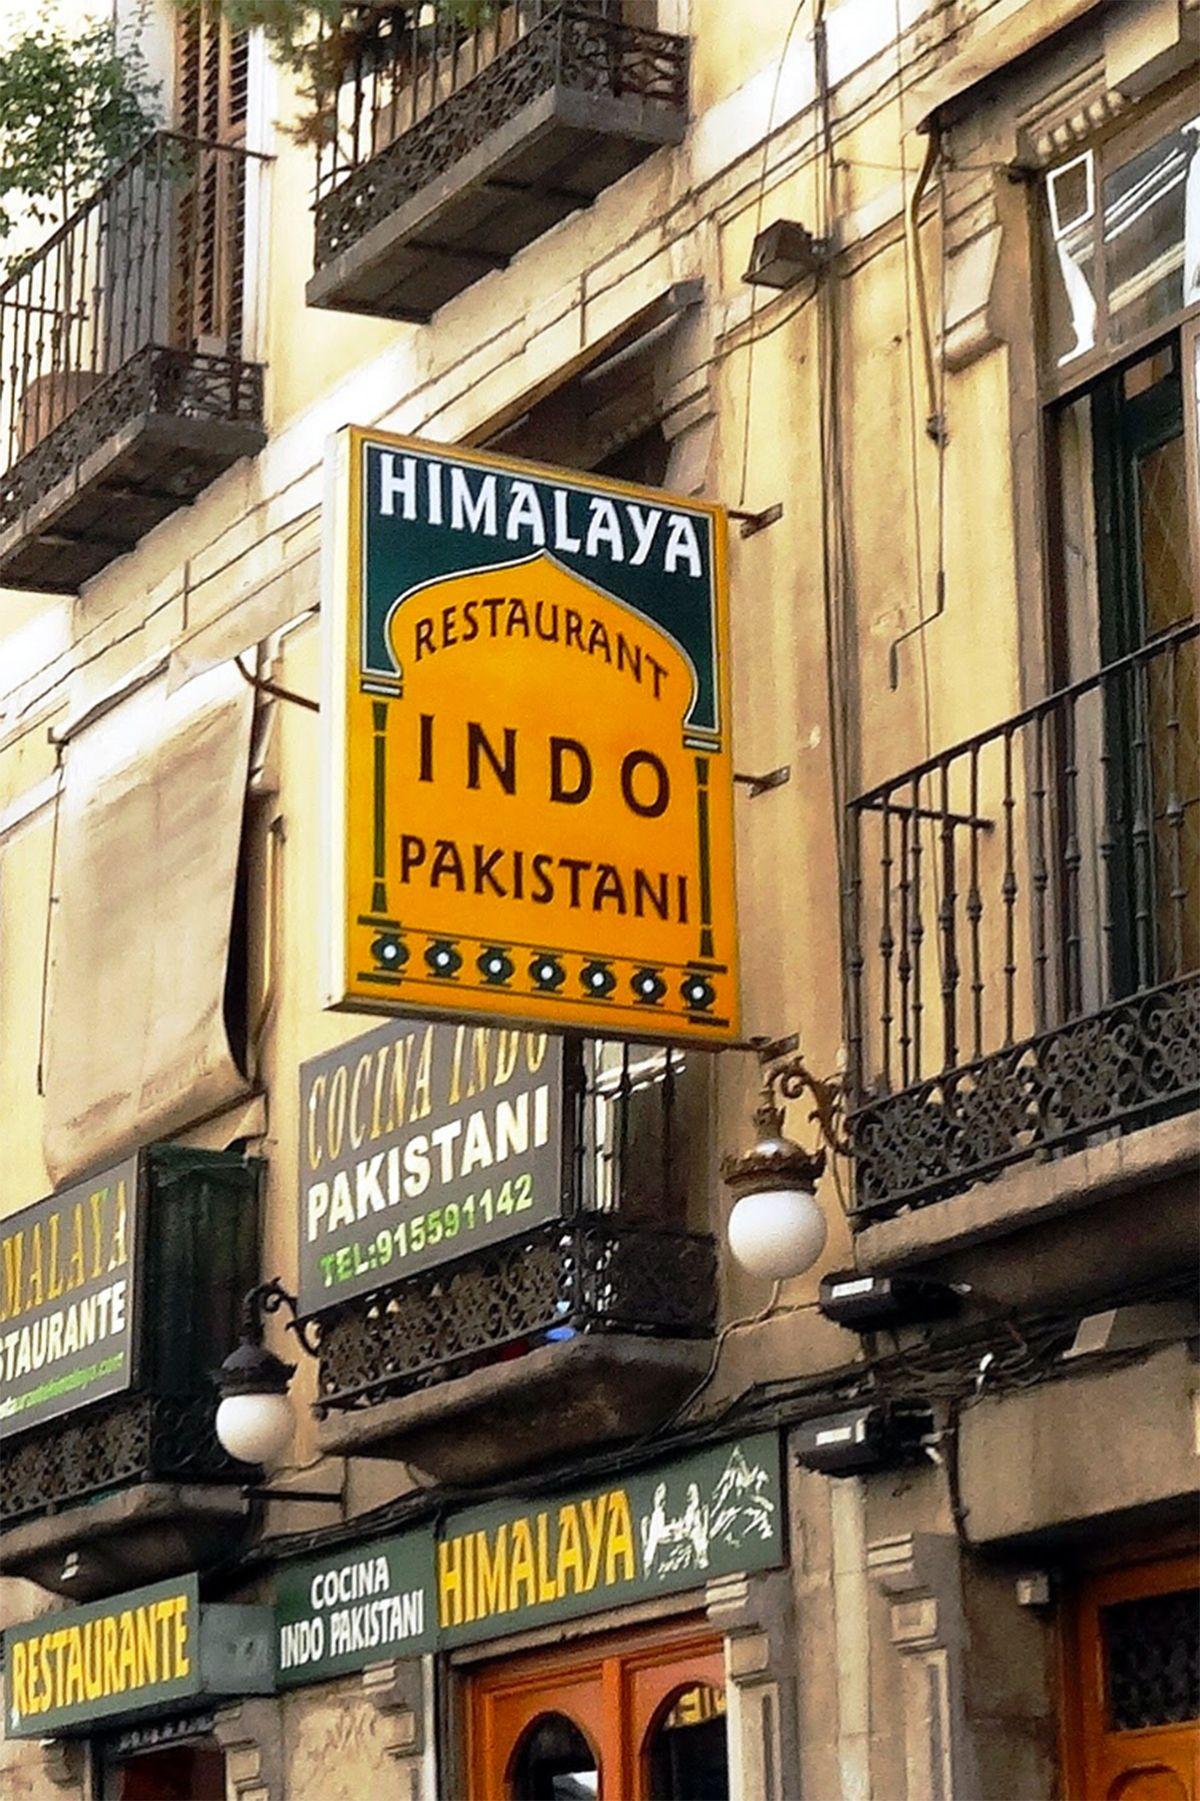 evento-mice-restaurante-himalaya-madrid-9